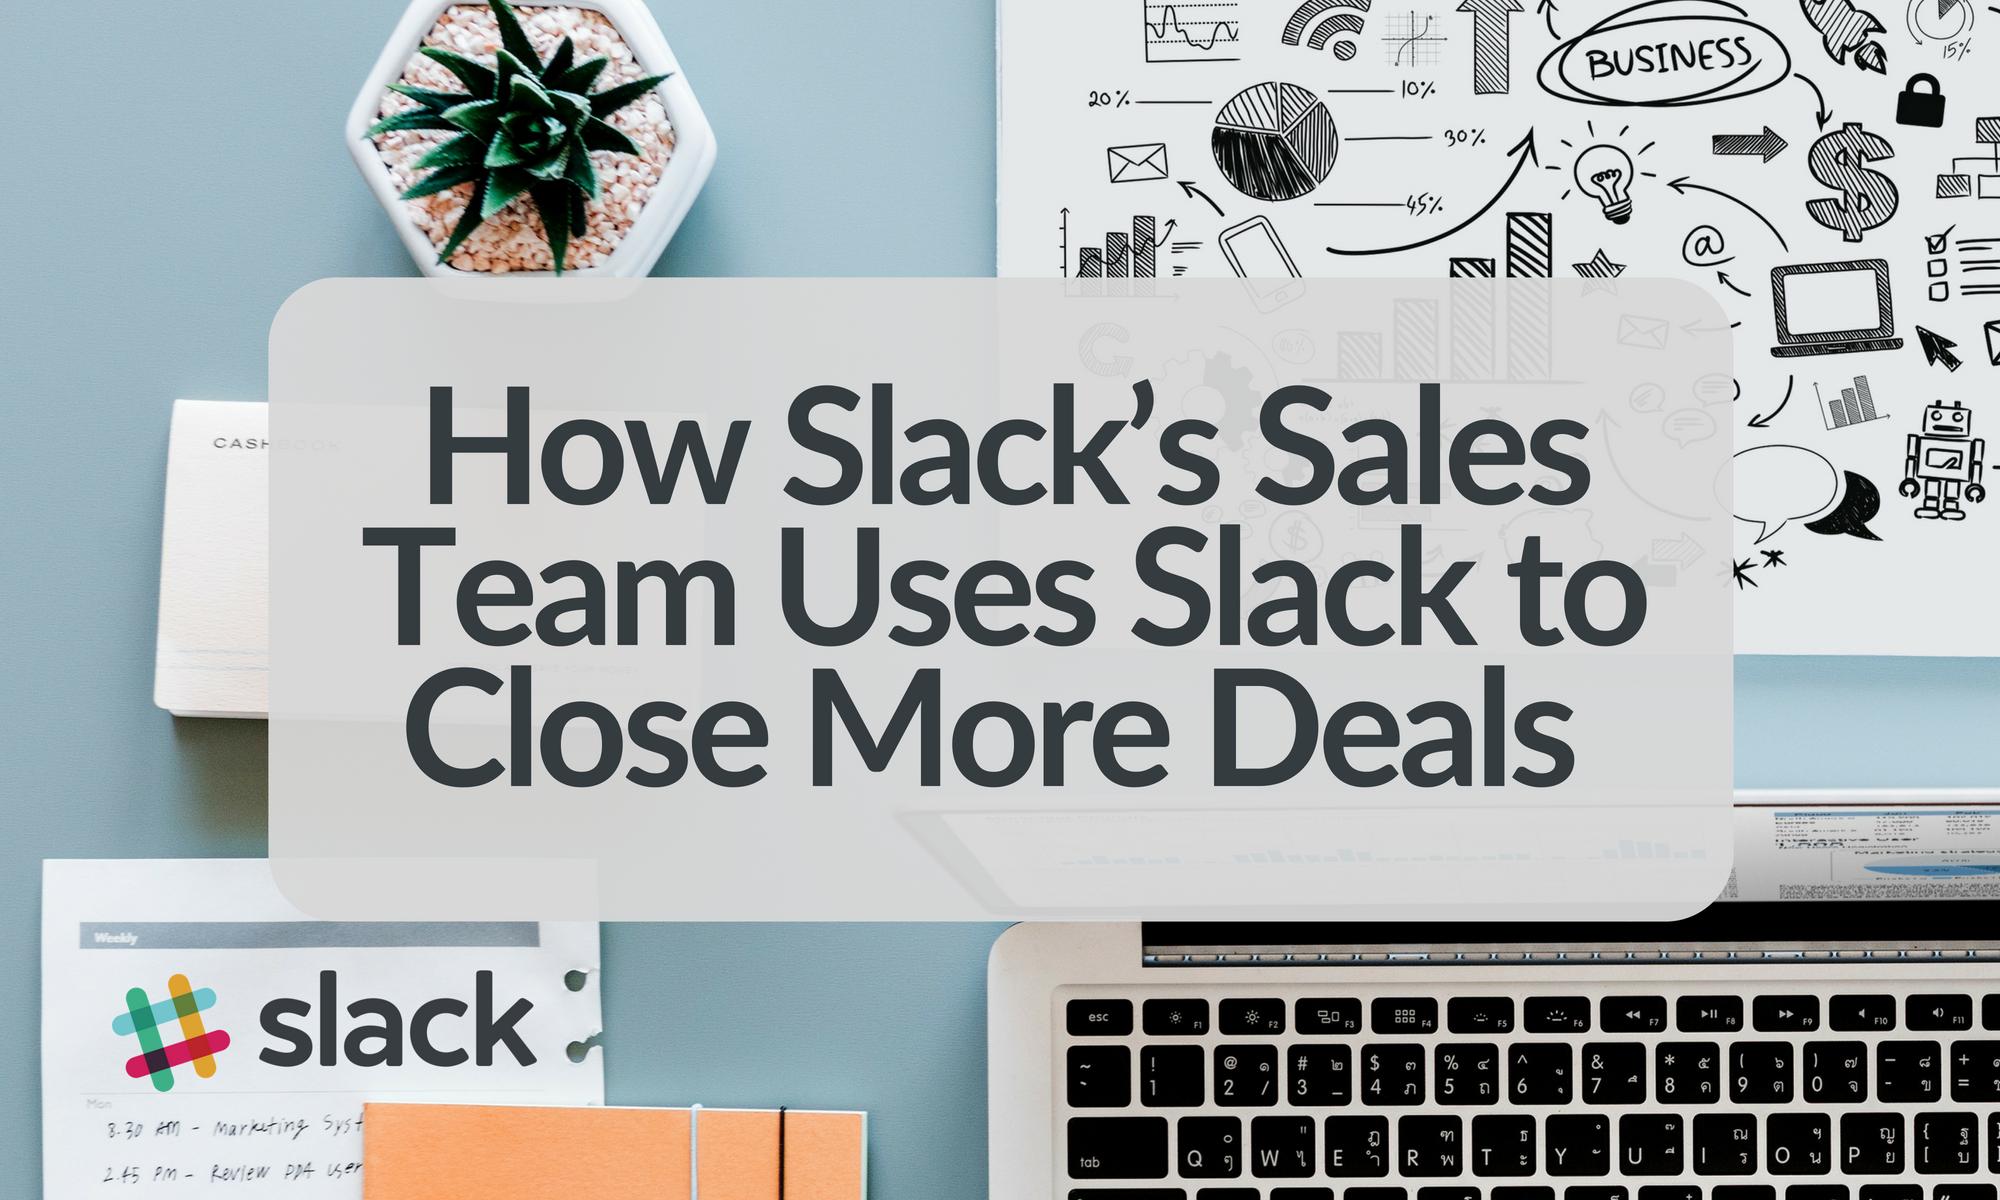 How Slack's Sales Team Uses Slack to Close More Deals